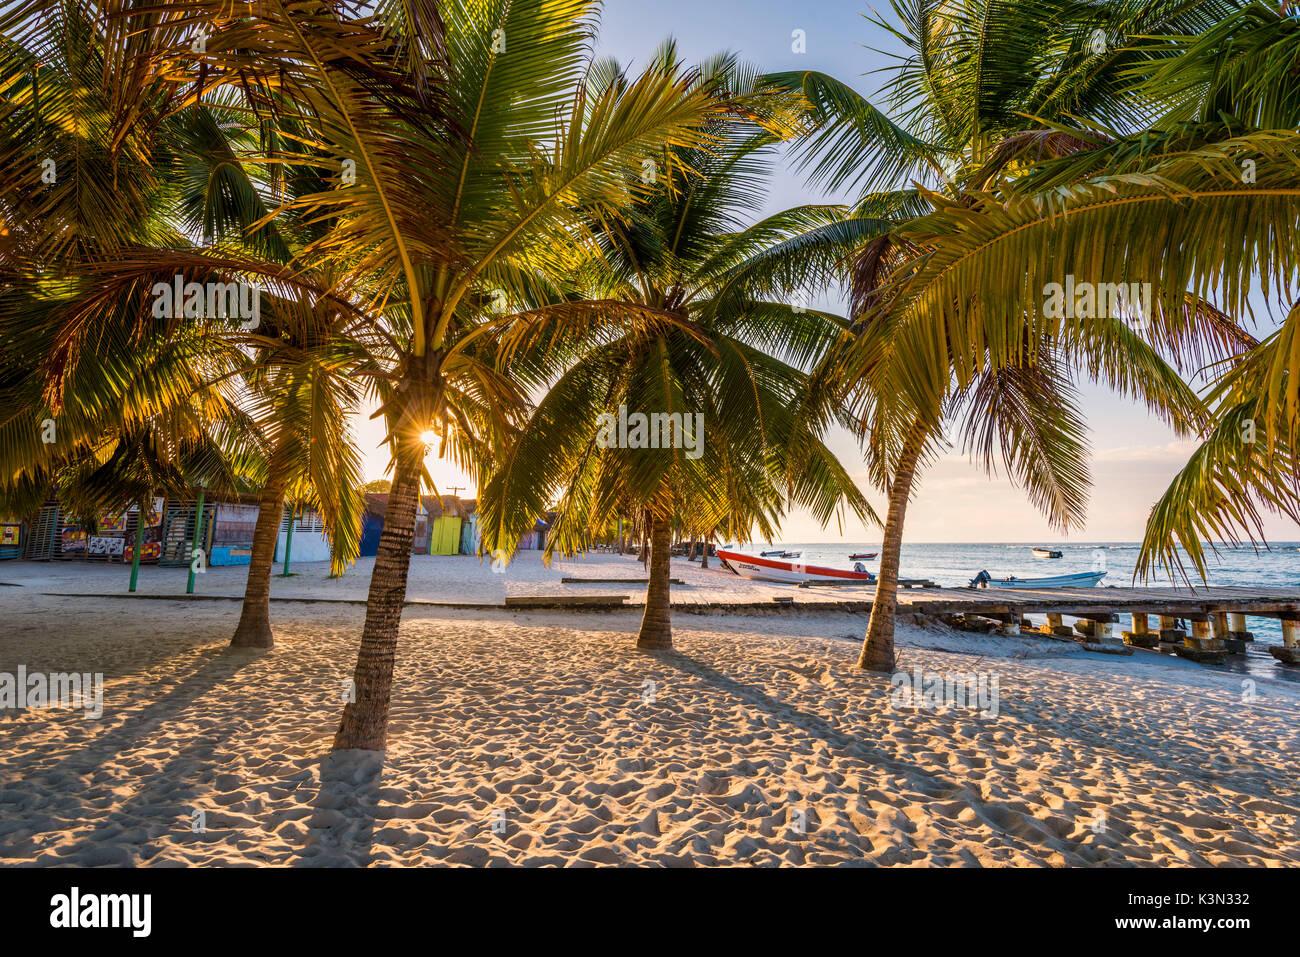 Mano Juan, Saona Island, East National Park (Parque Nacional del Este), Dominican Republic, Caribbean Sea. - Stock Image